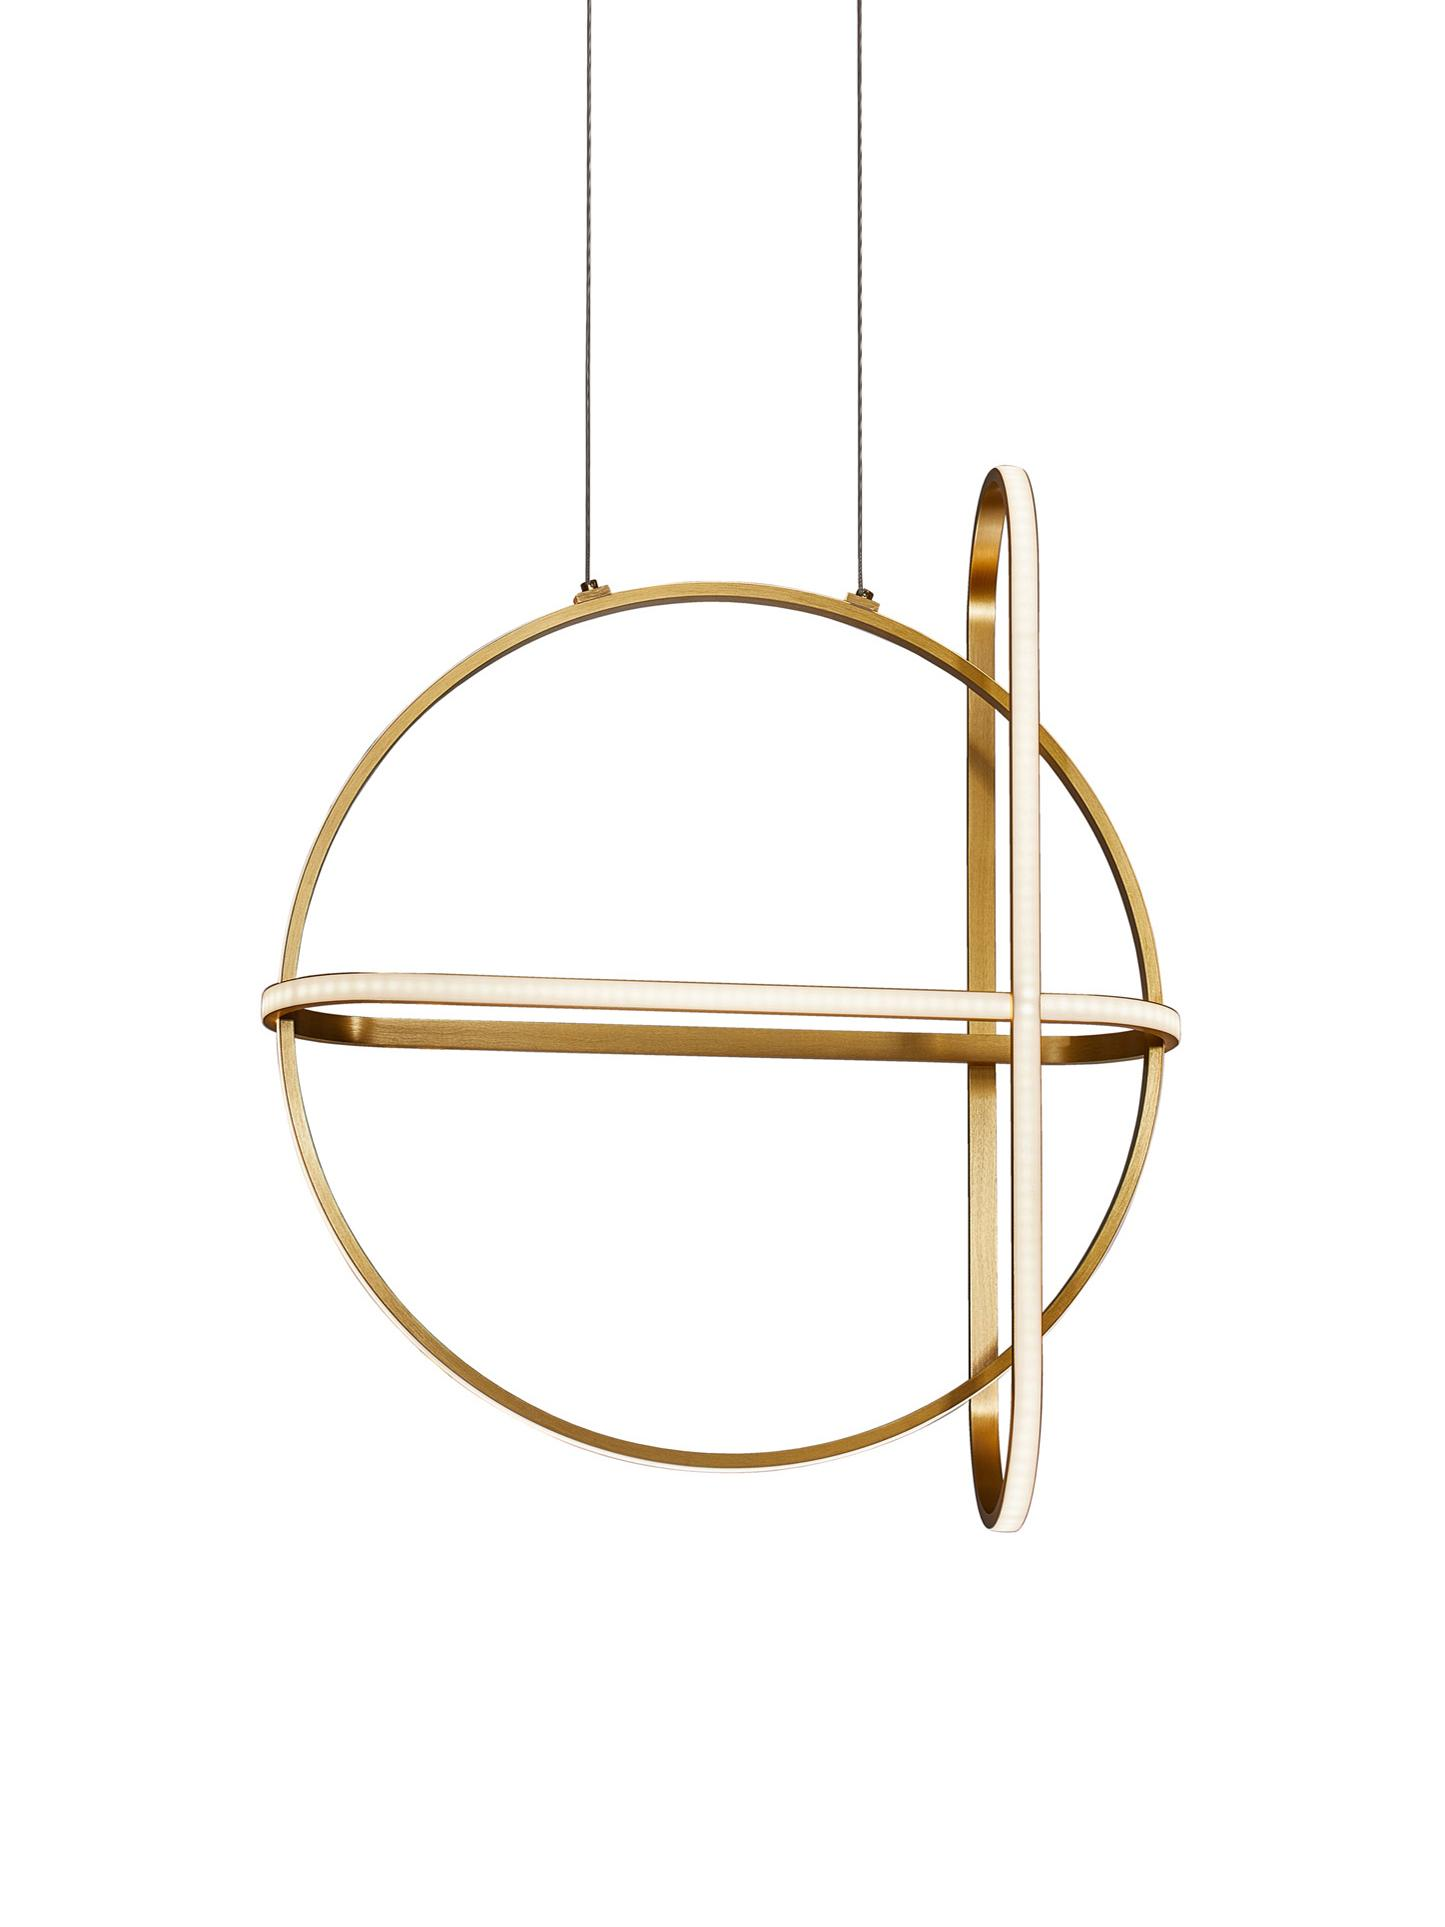 LED Pendelleuchte Arte in Messing, Diffusorscheibe: Acrylglas, Baldachin: Aluminium, beschichtet, Messingfarben, 52 x 120 cm